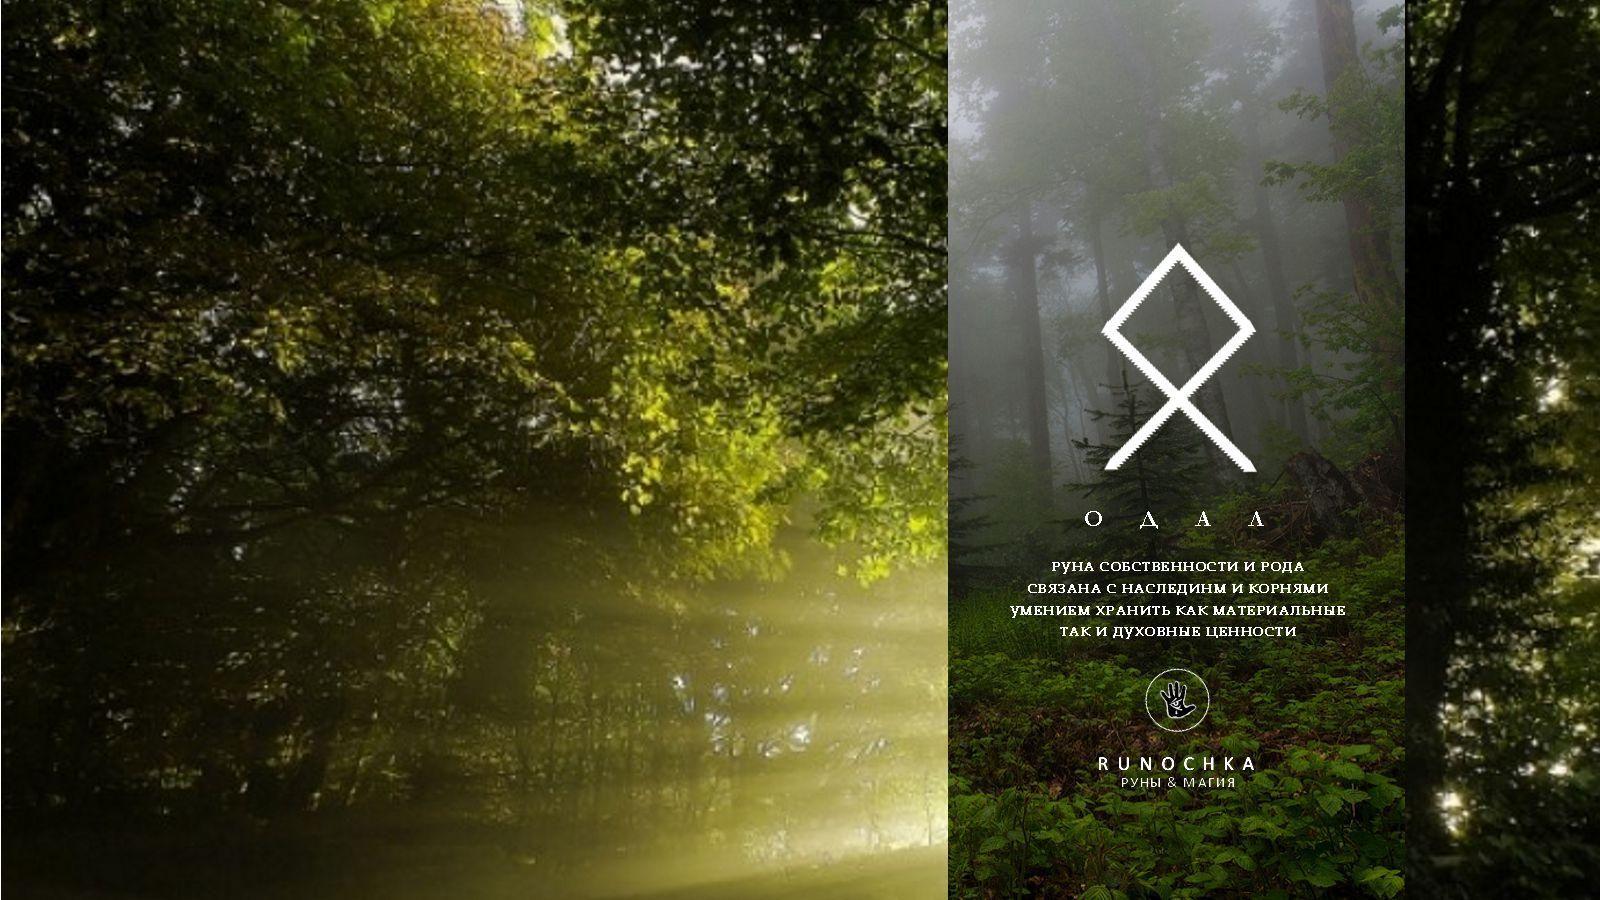 Руна Одал: значение, описание и ее толкование с фото